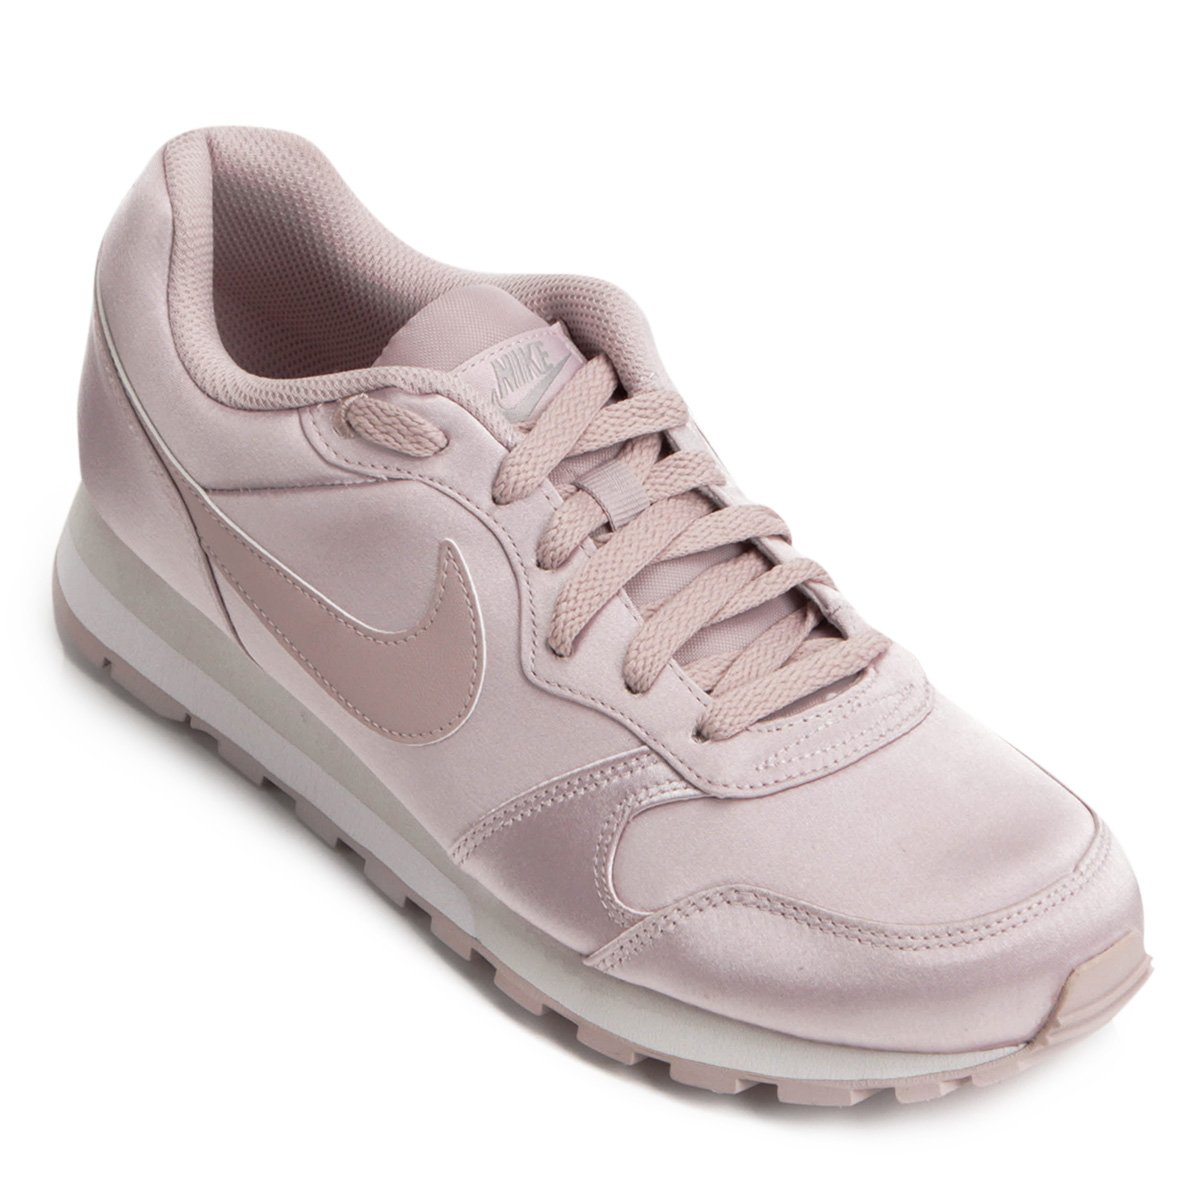 473b9ca0871f2 Tênis Nike Md Runner 2 Feminino - Rosa Claro - Compre Agora